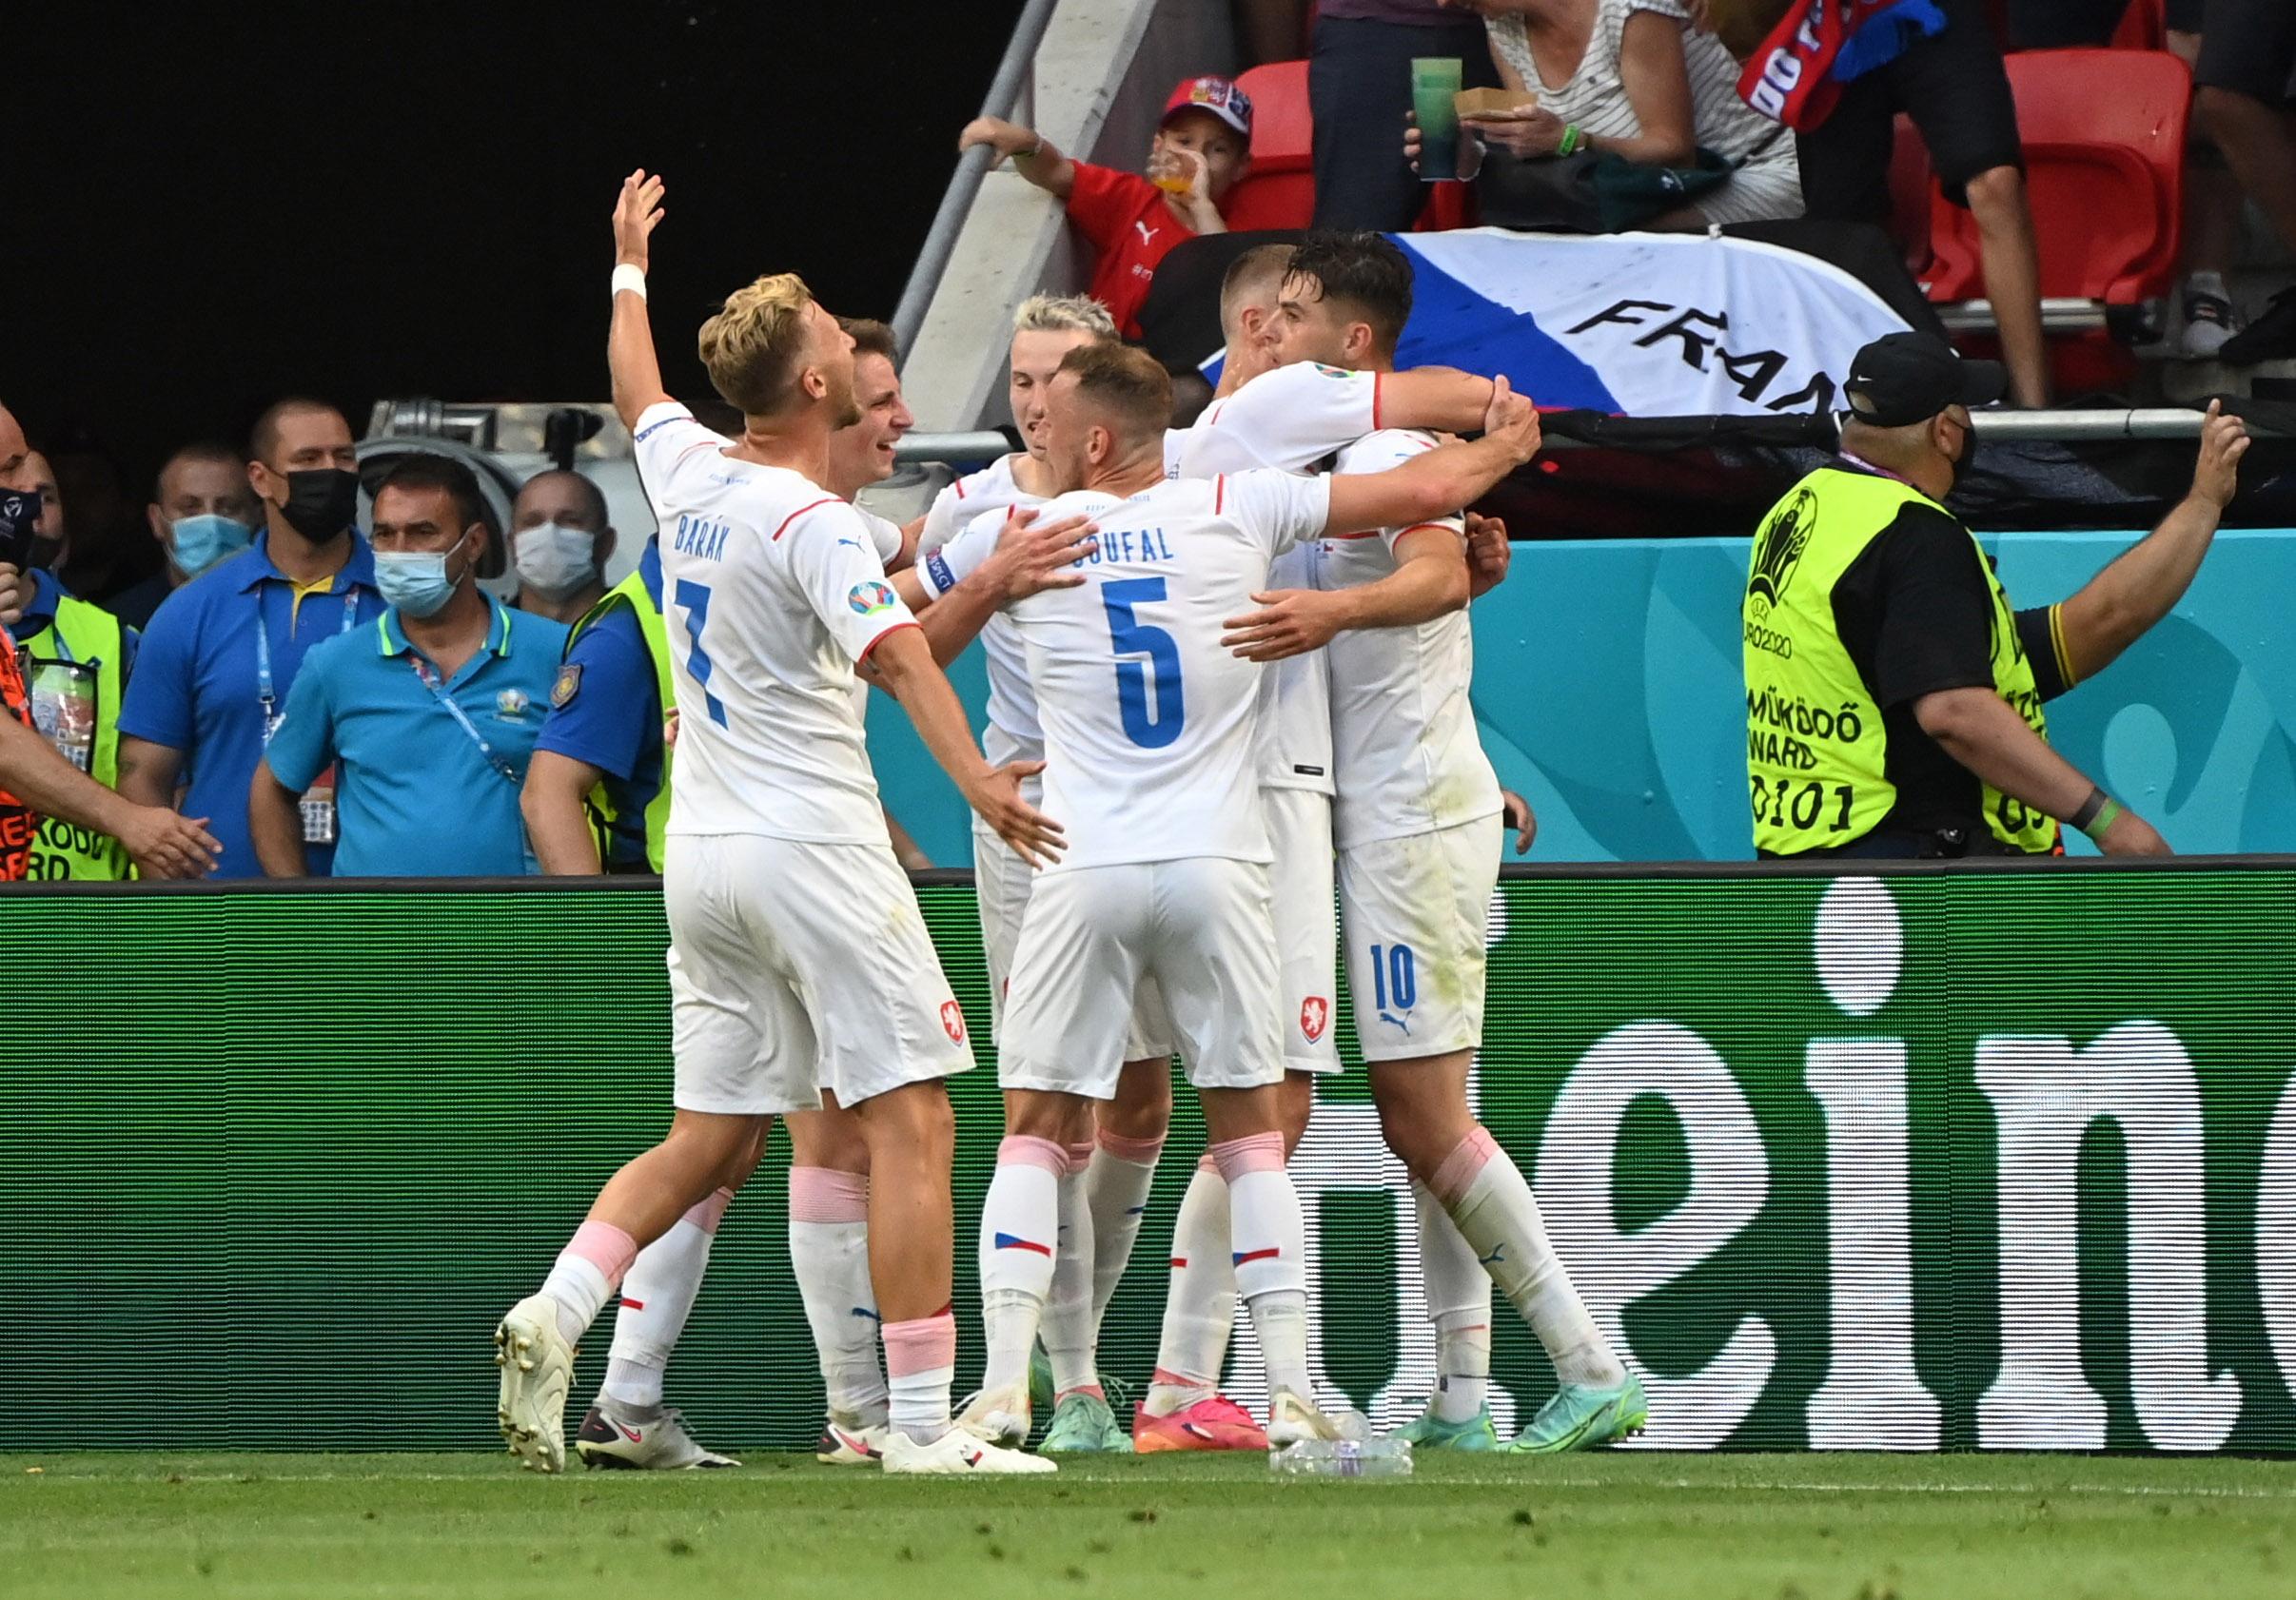 Euro 2020, Ολλανδία – Τσεχία 0-2: Οι Τσέχοι σόκαραν τους Οράνιε και πέρασαν στα προημιτελικά